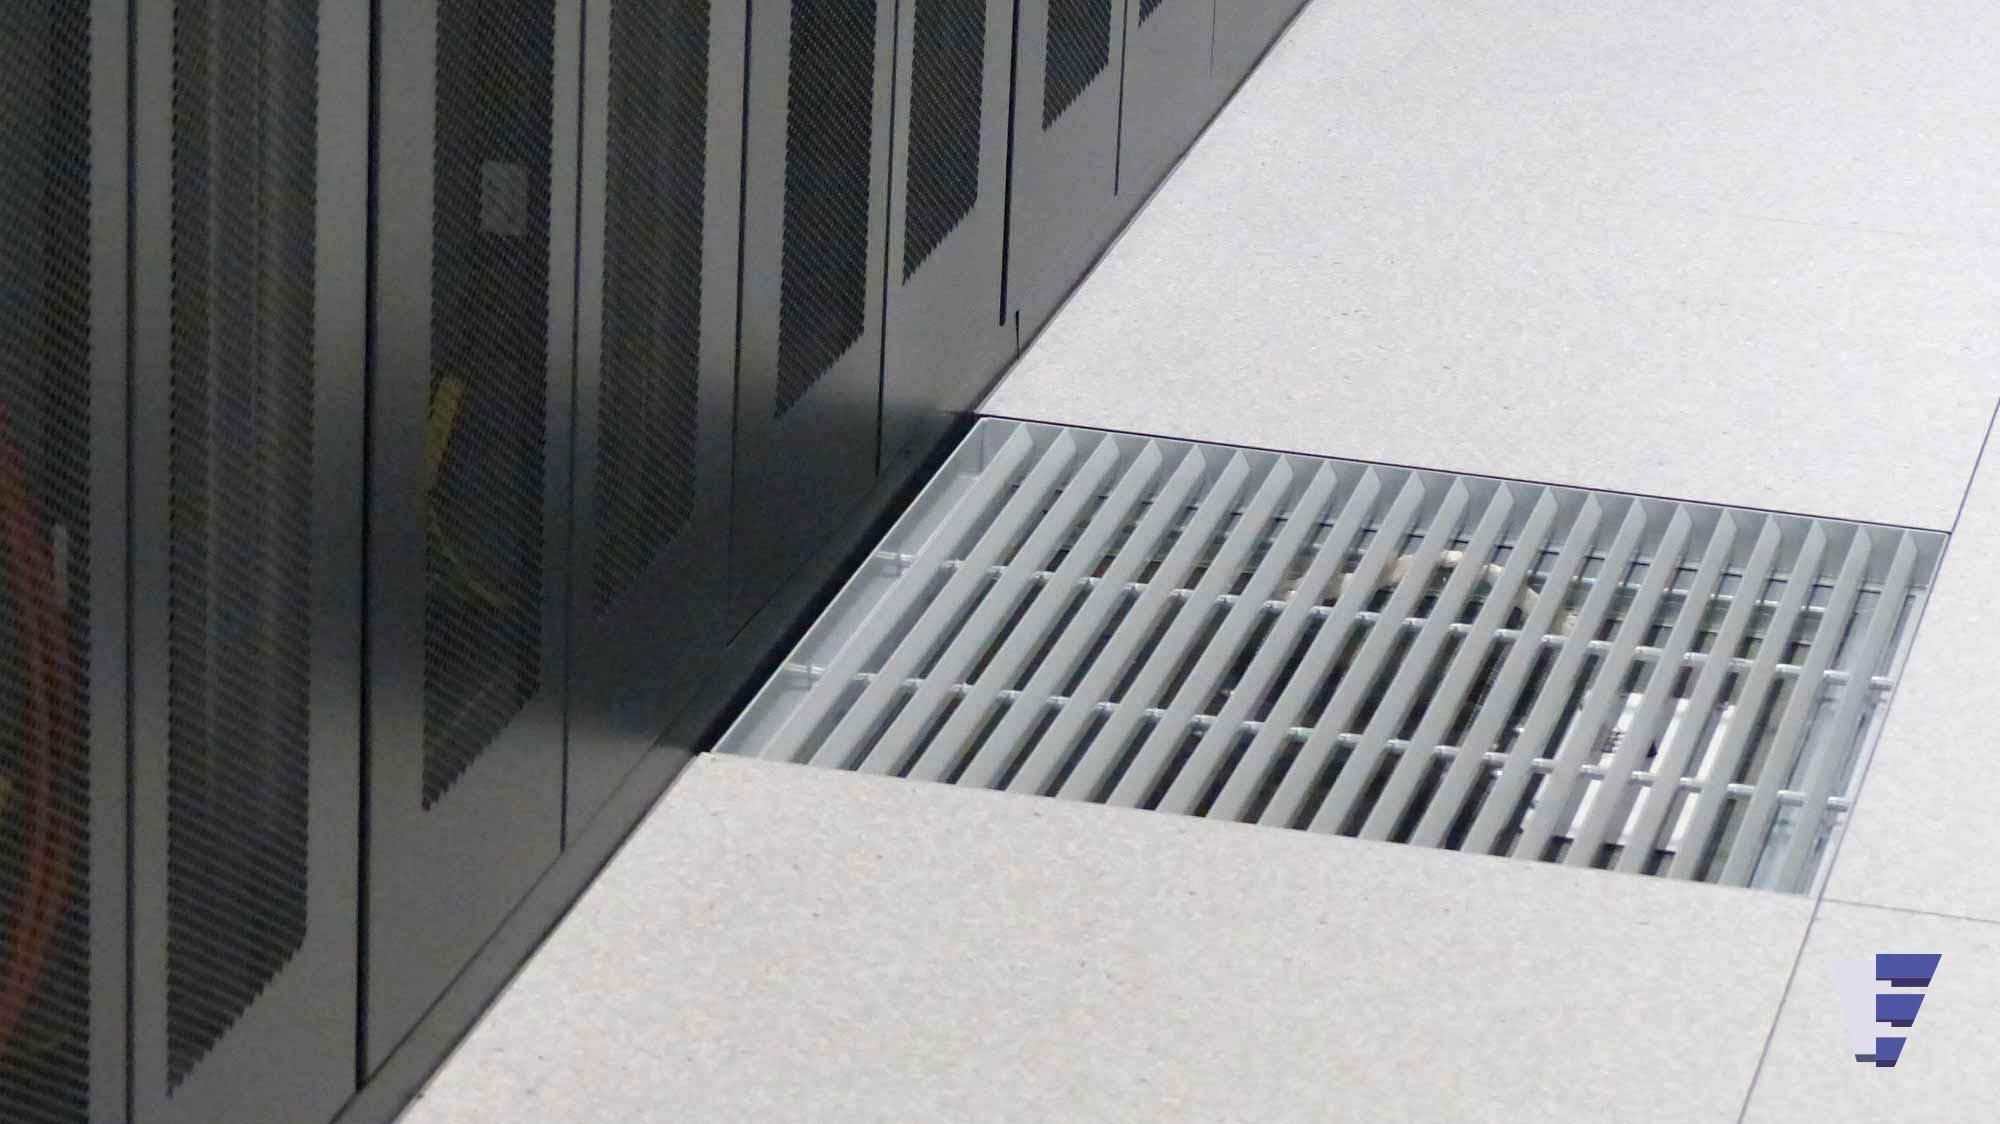 Velčić Ltd - Floor fan unit - for Large data and communication